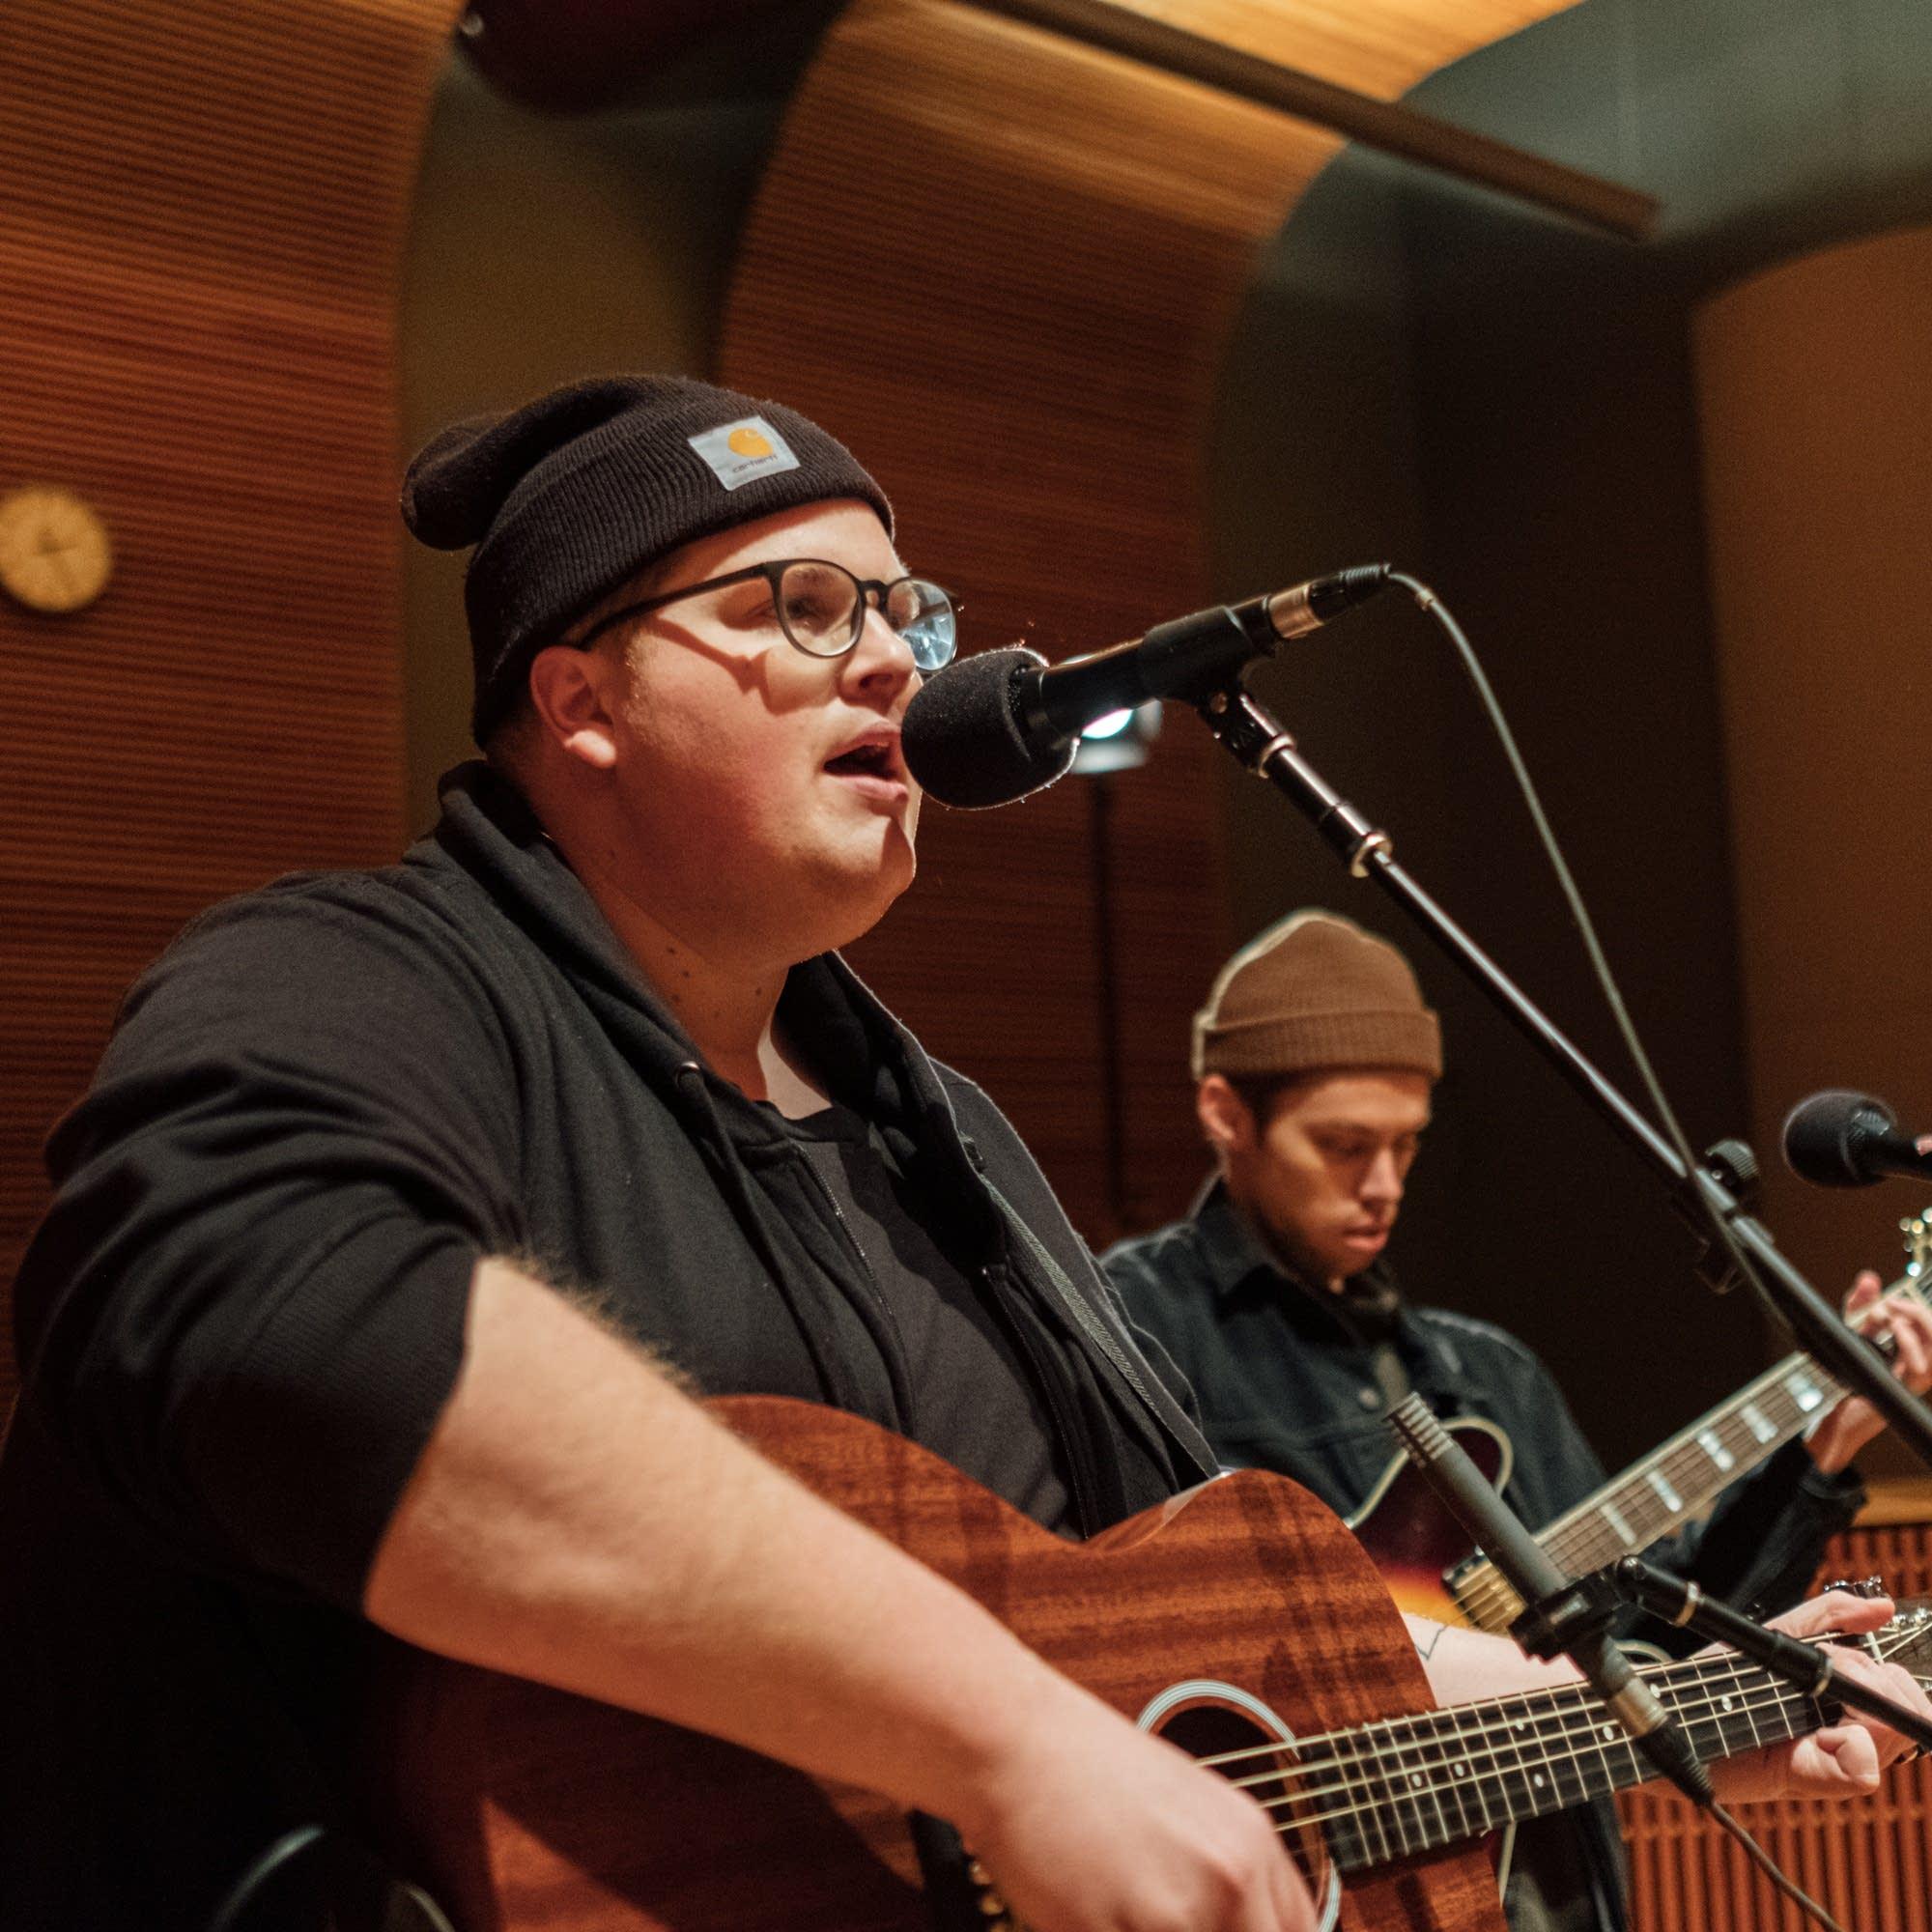 Michigander perform in The Current studio